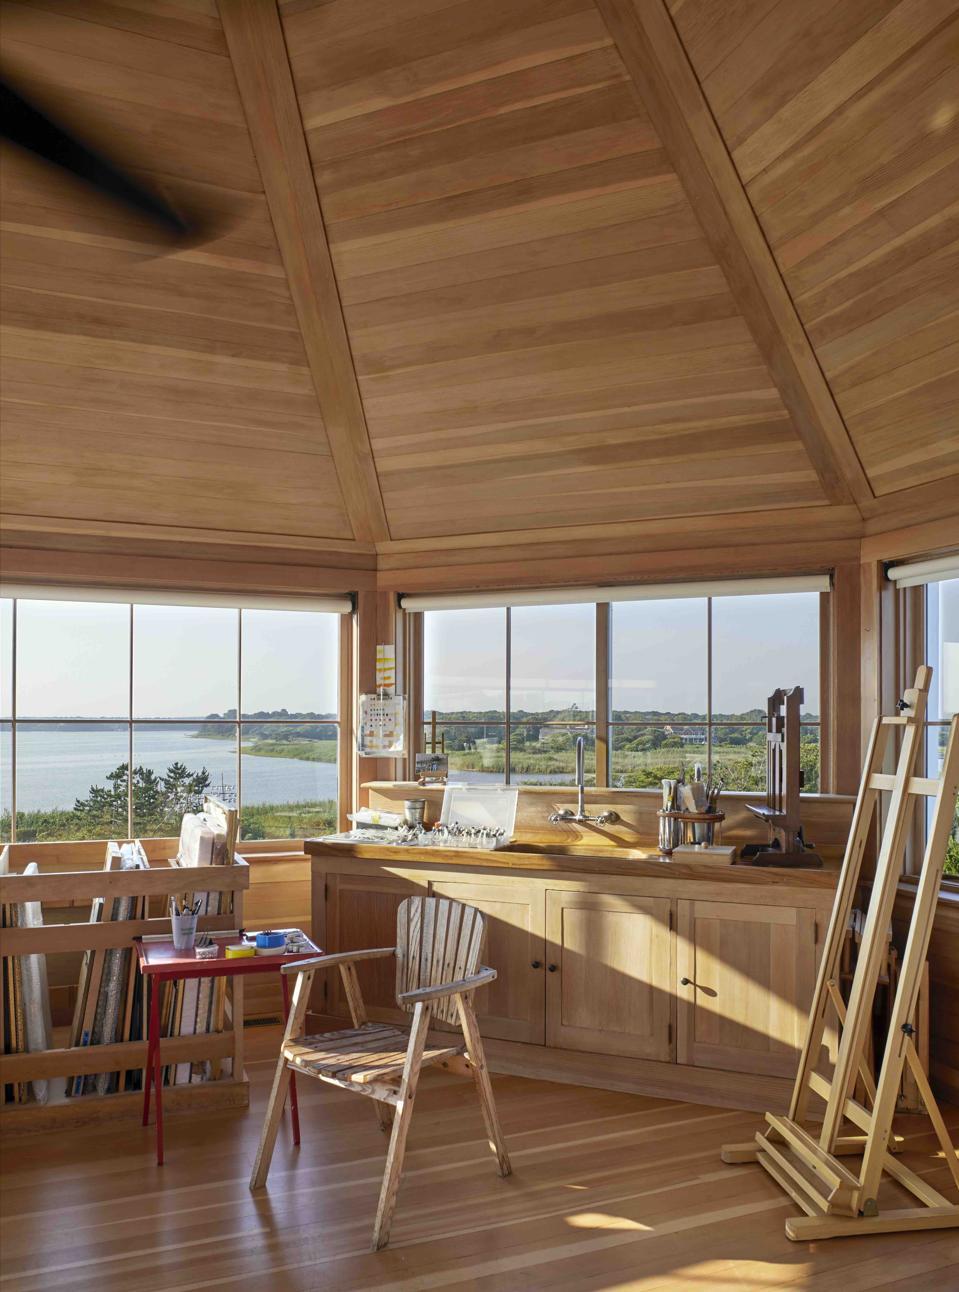 Artist studio designed by Pietro Cicognani for William Rayner